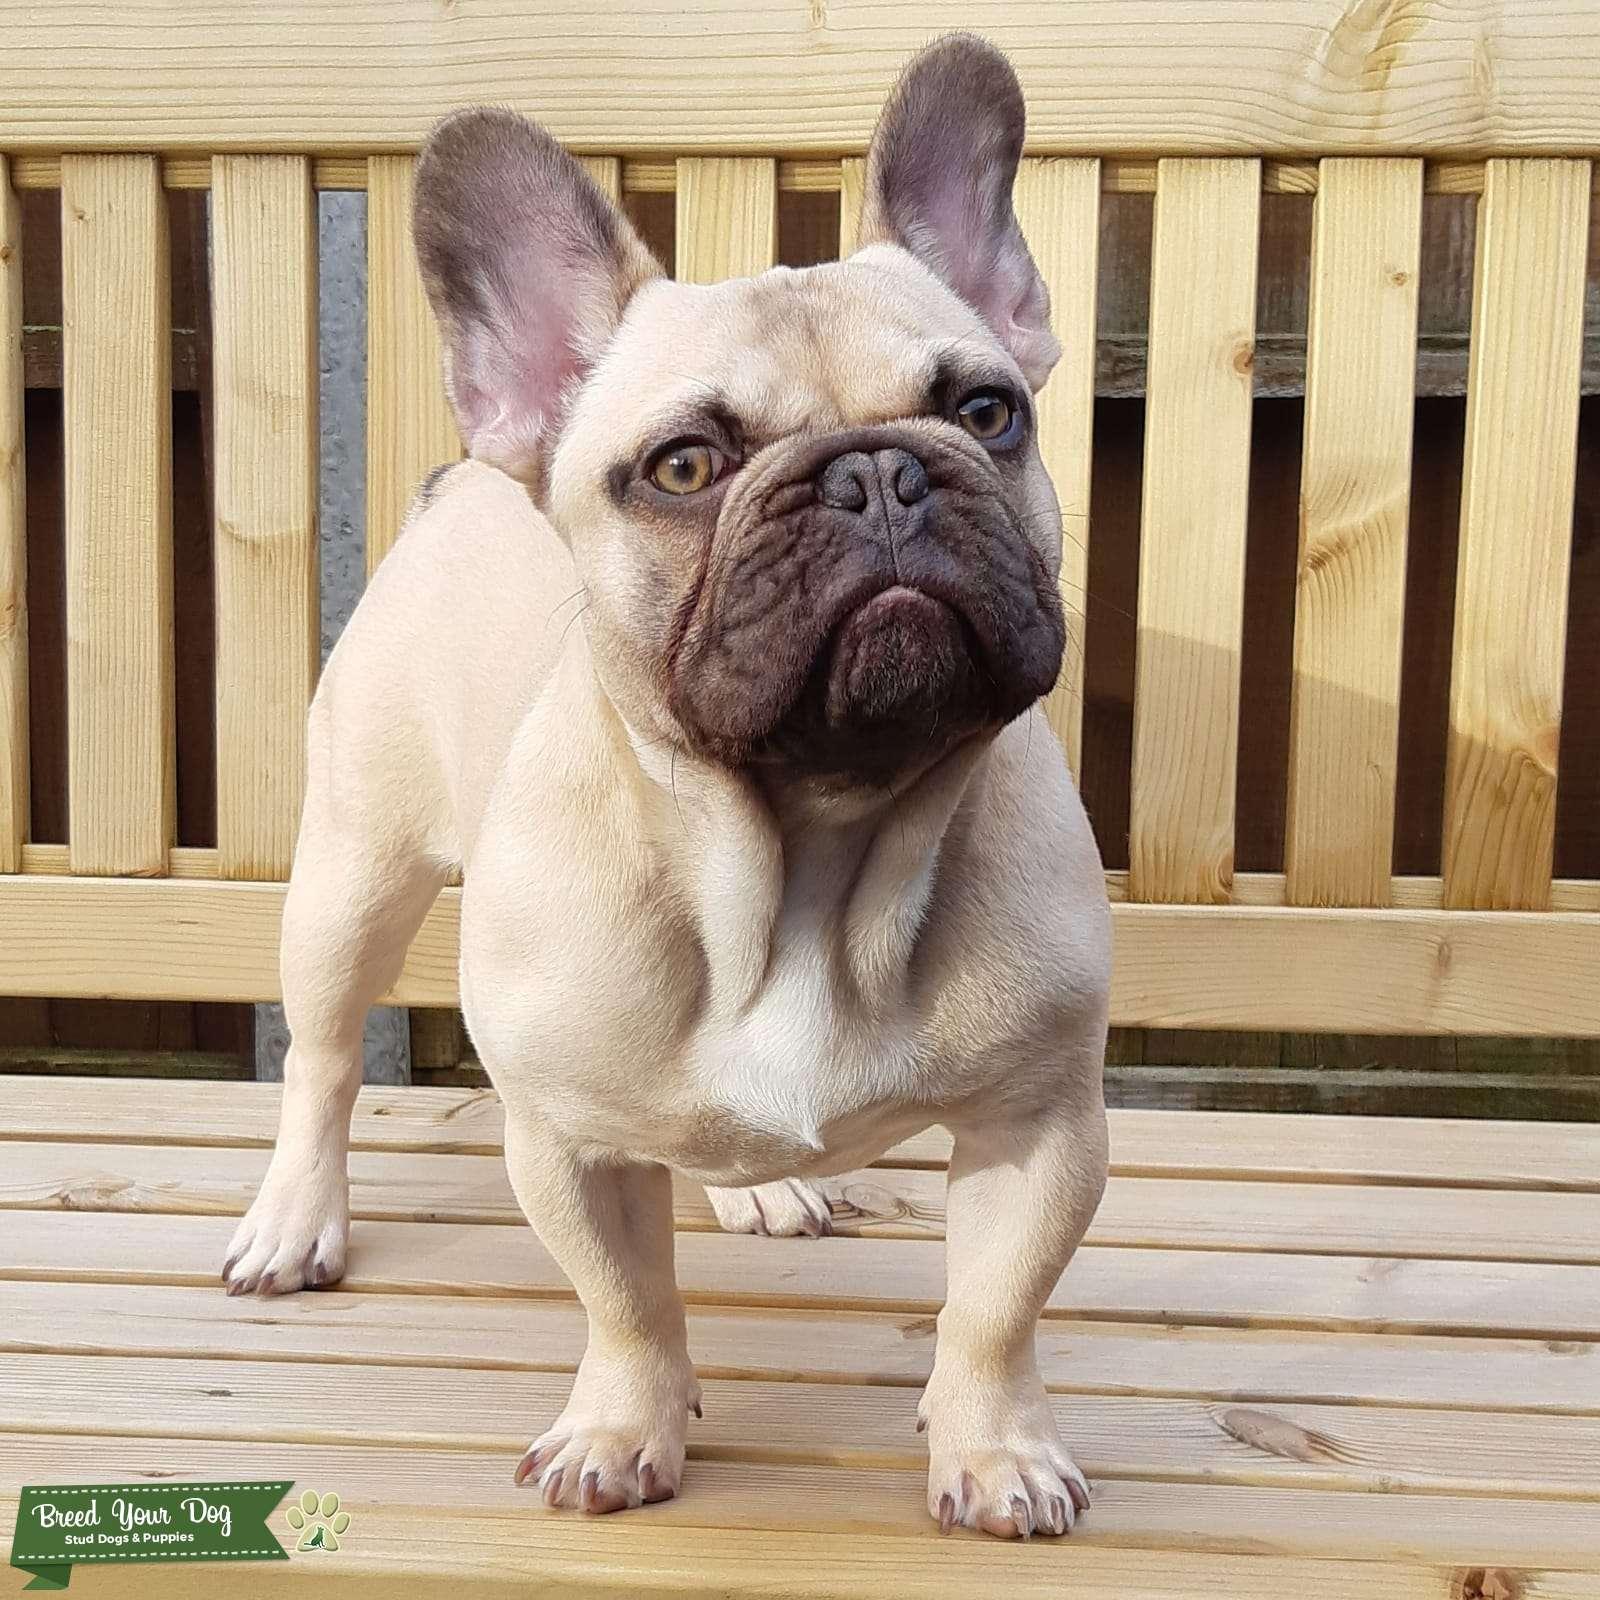 Stud Dog Chocolate Fawn French Bulldog For Stud Breed